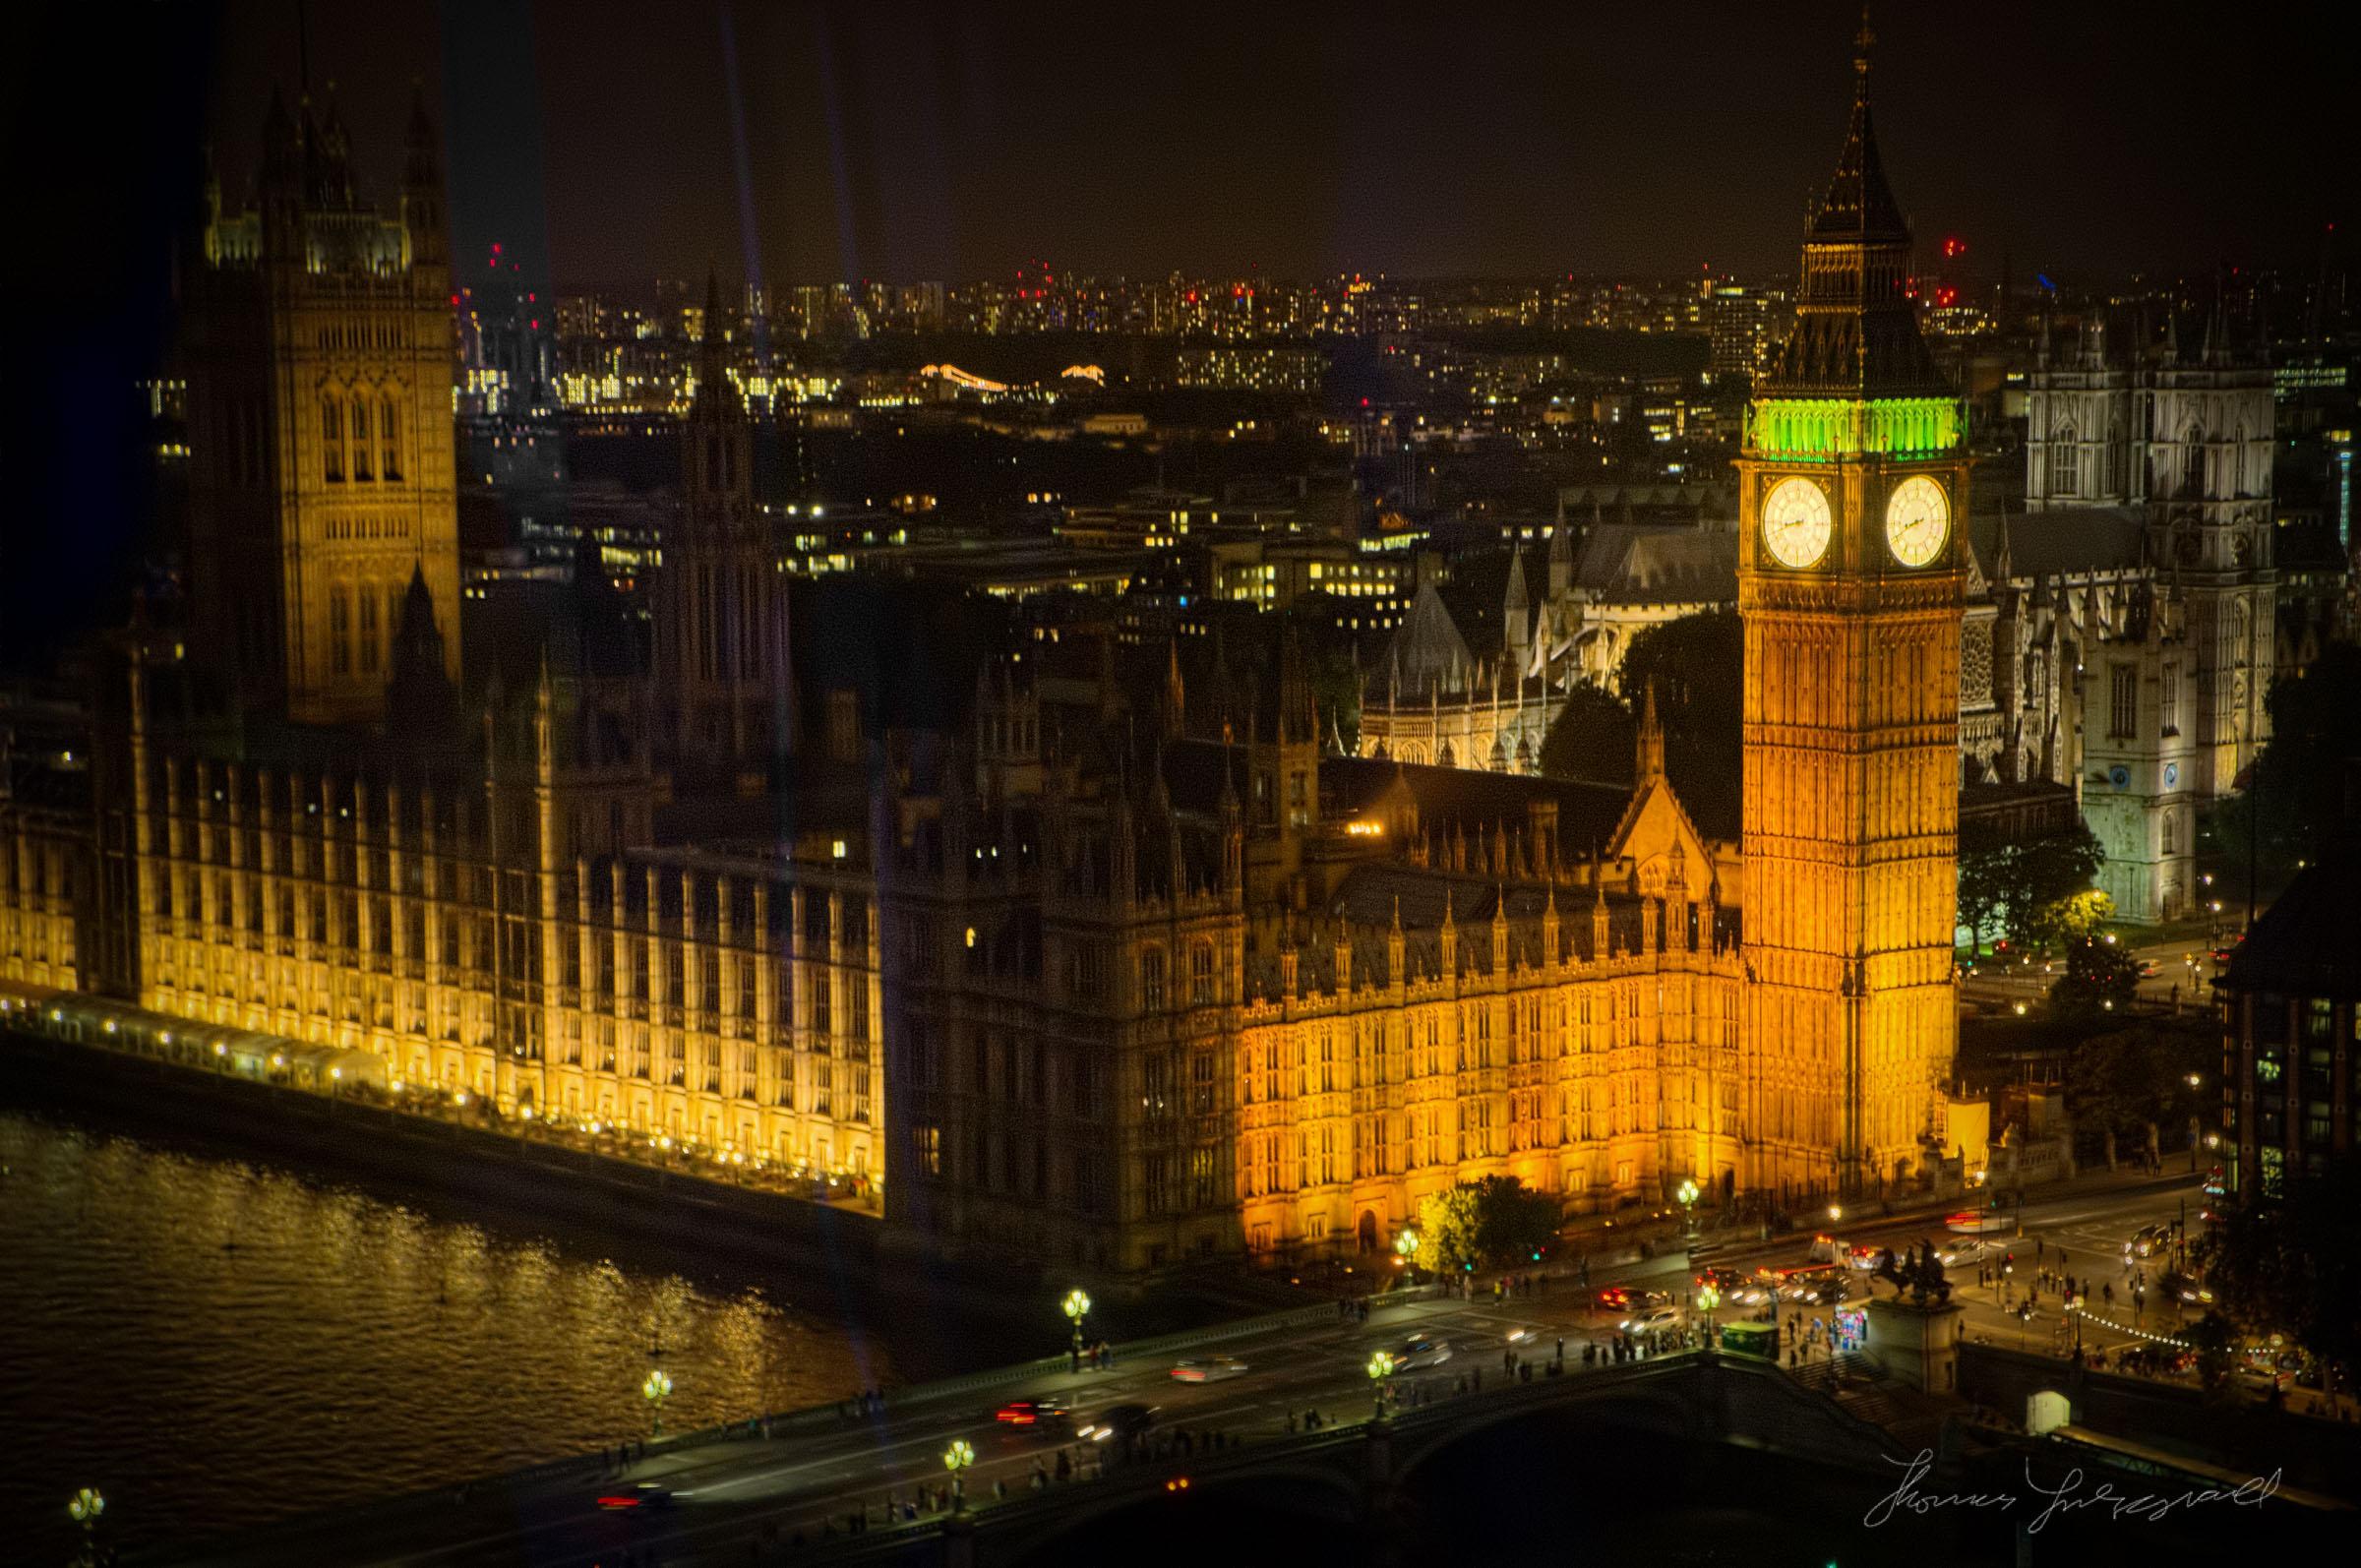 A closeup of Big Ben and Parliament at Night